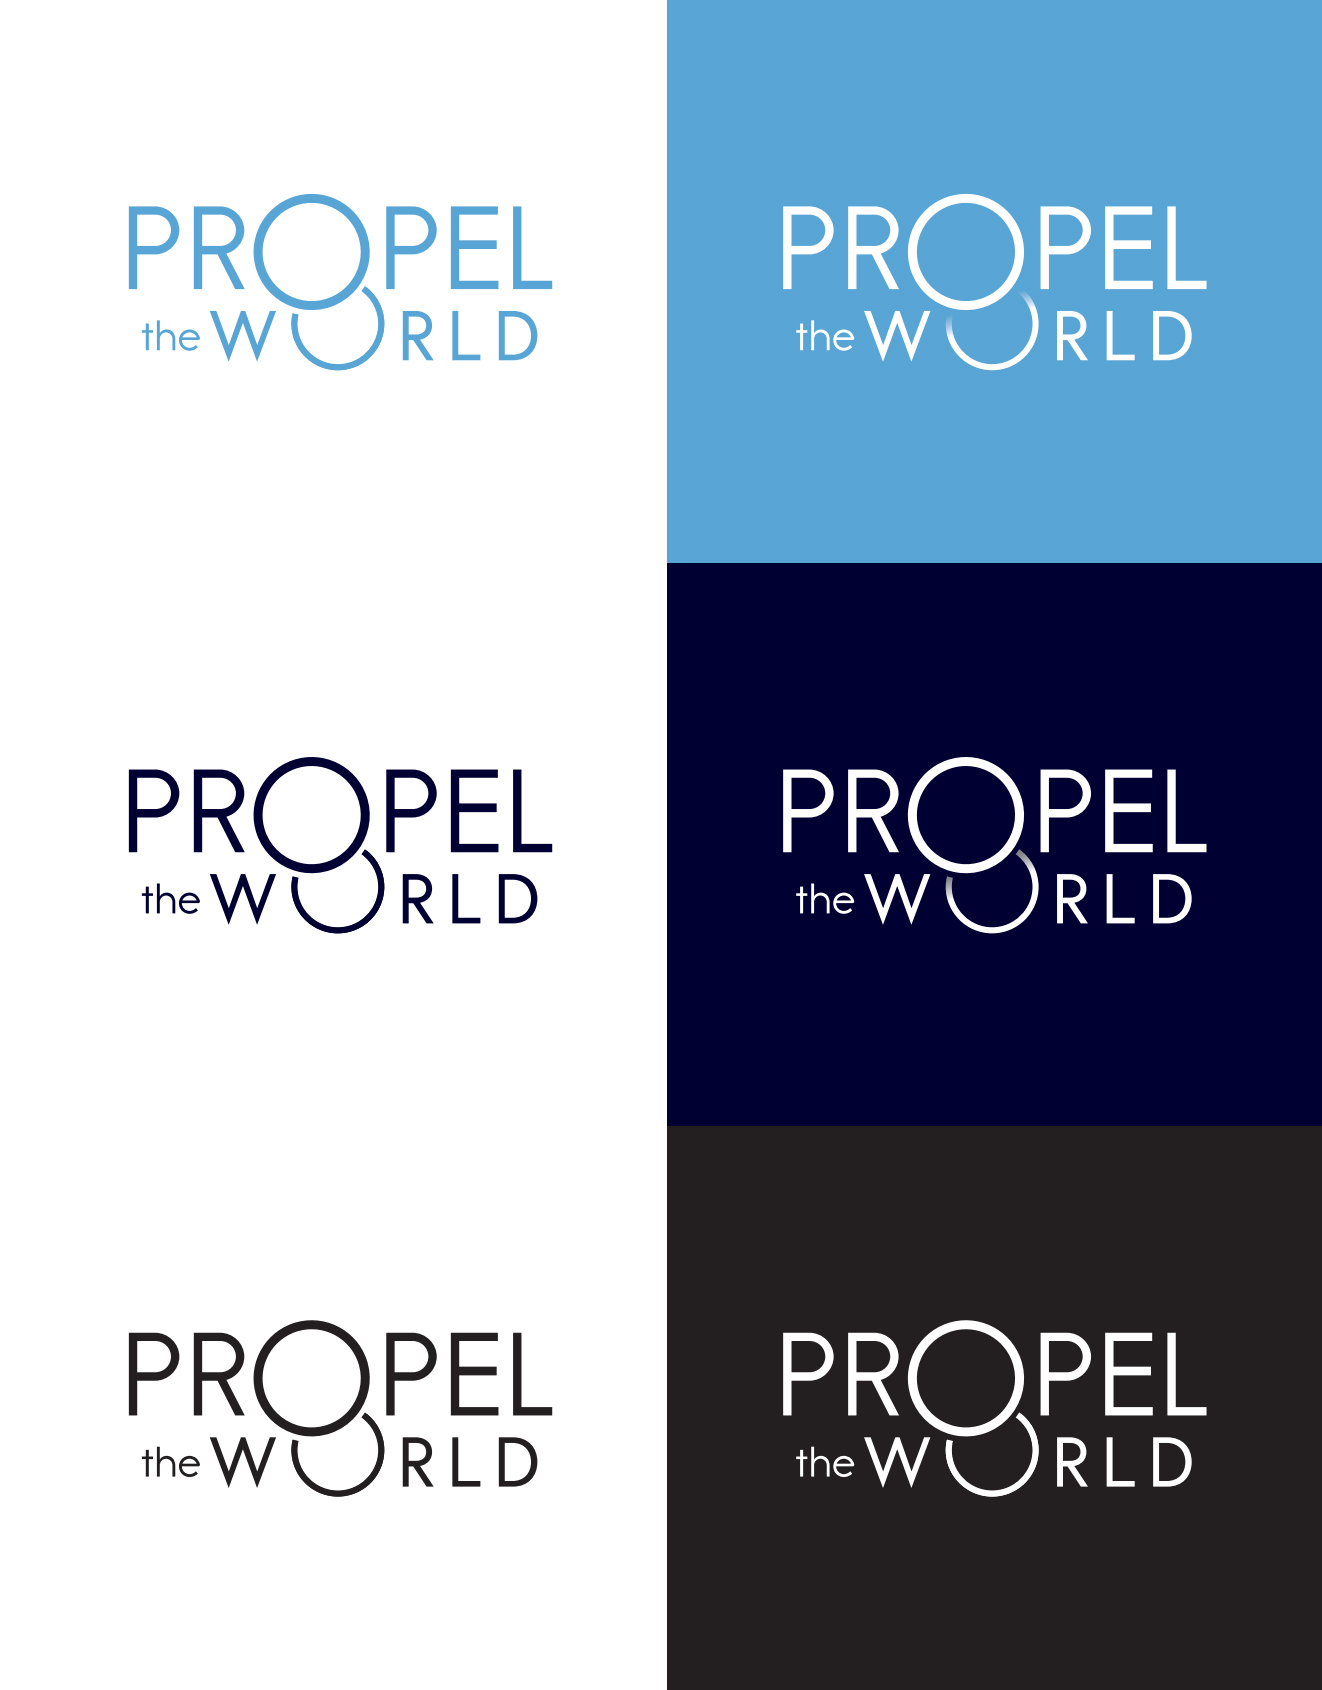 Branding: Propel the World logotypes